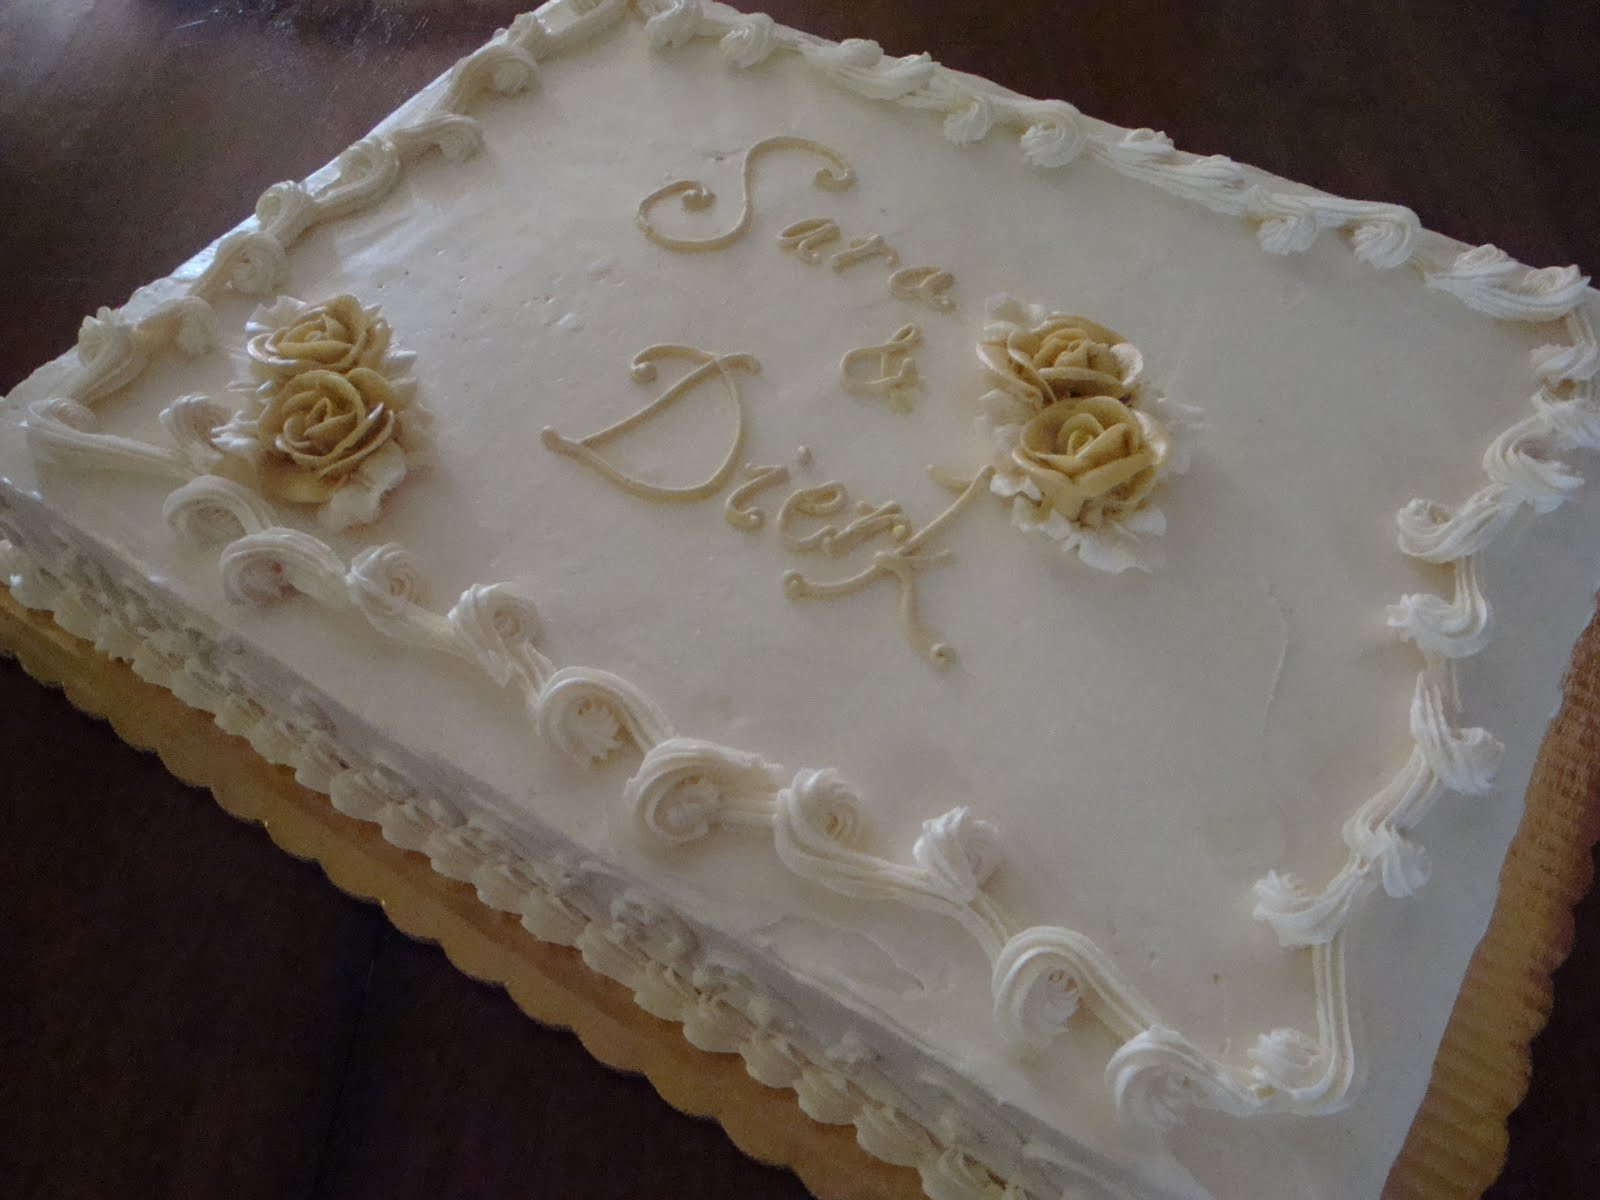 Wedding Sheet Cakes  The Jaded Spoon Sara s Wedding Cakes